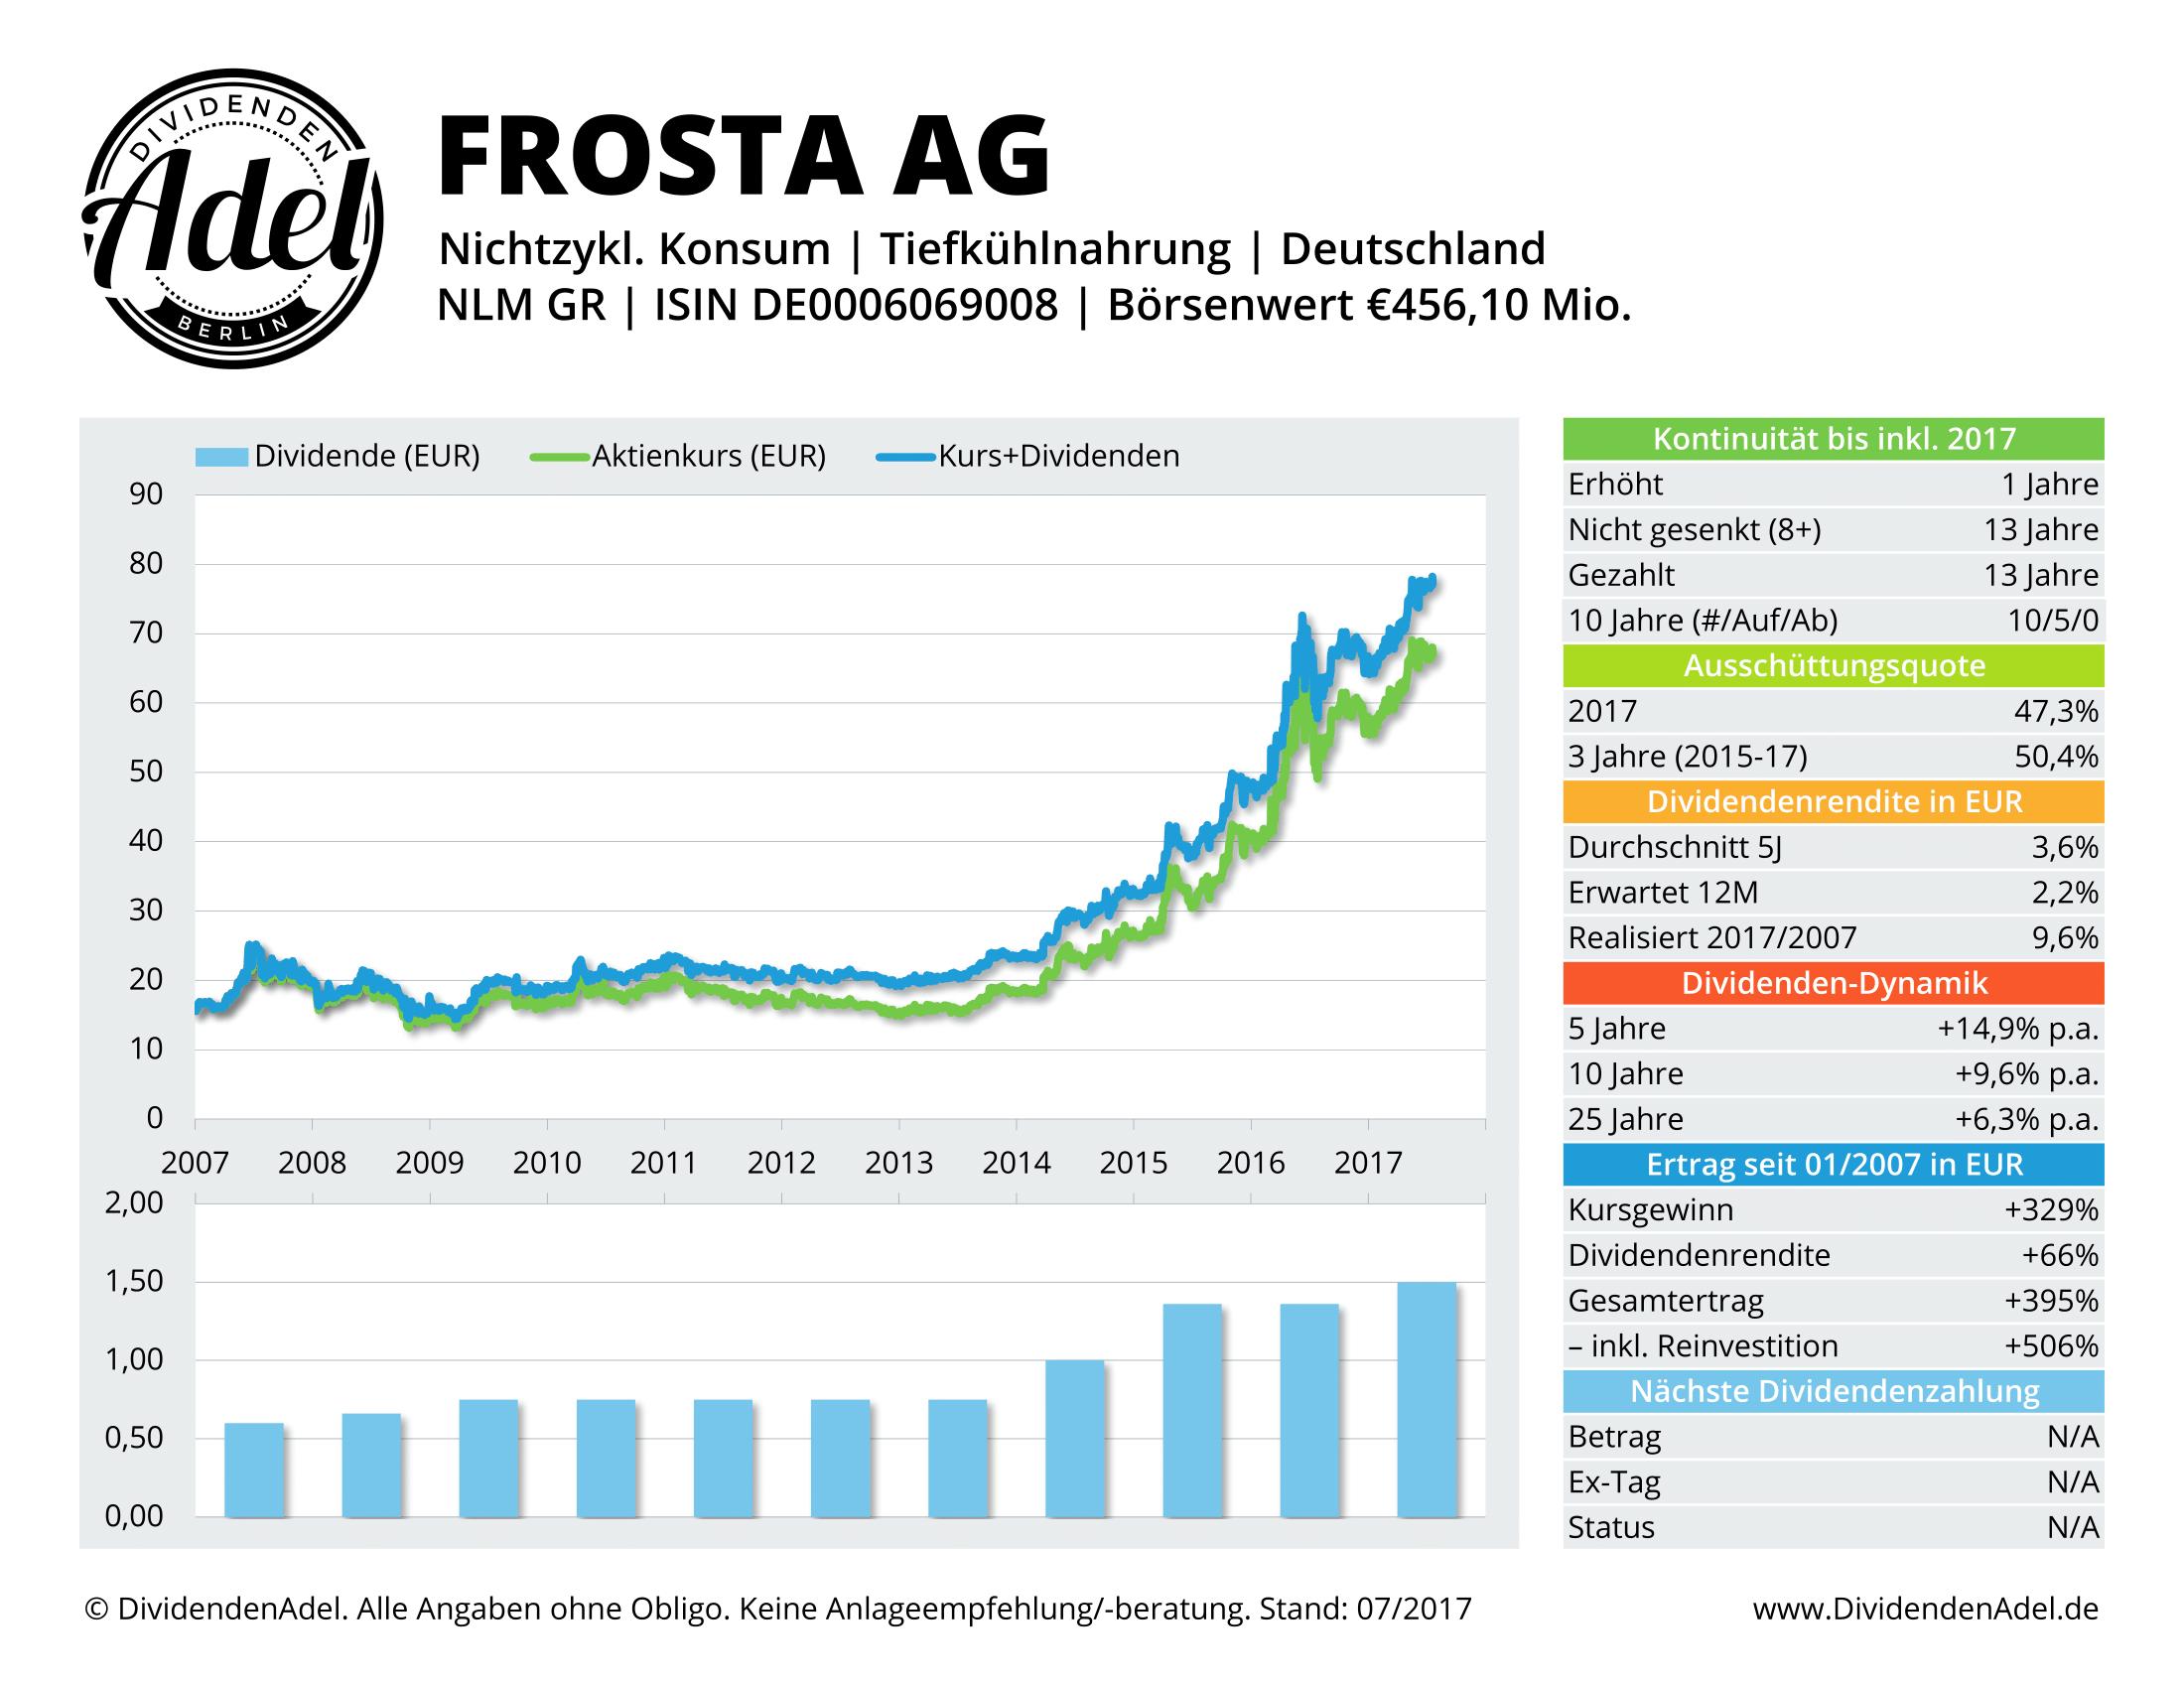 FROSTA AG DividendenAdel-Profil